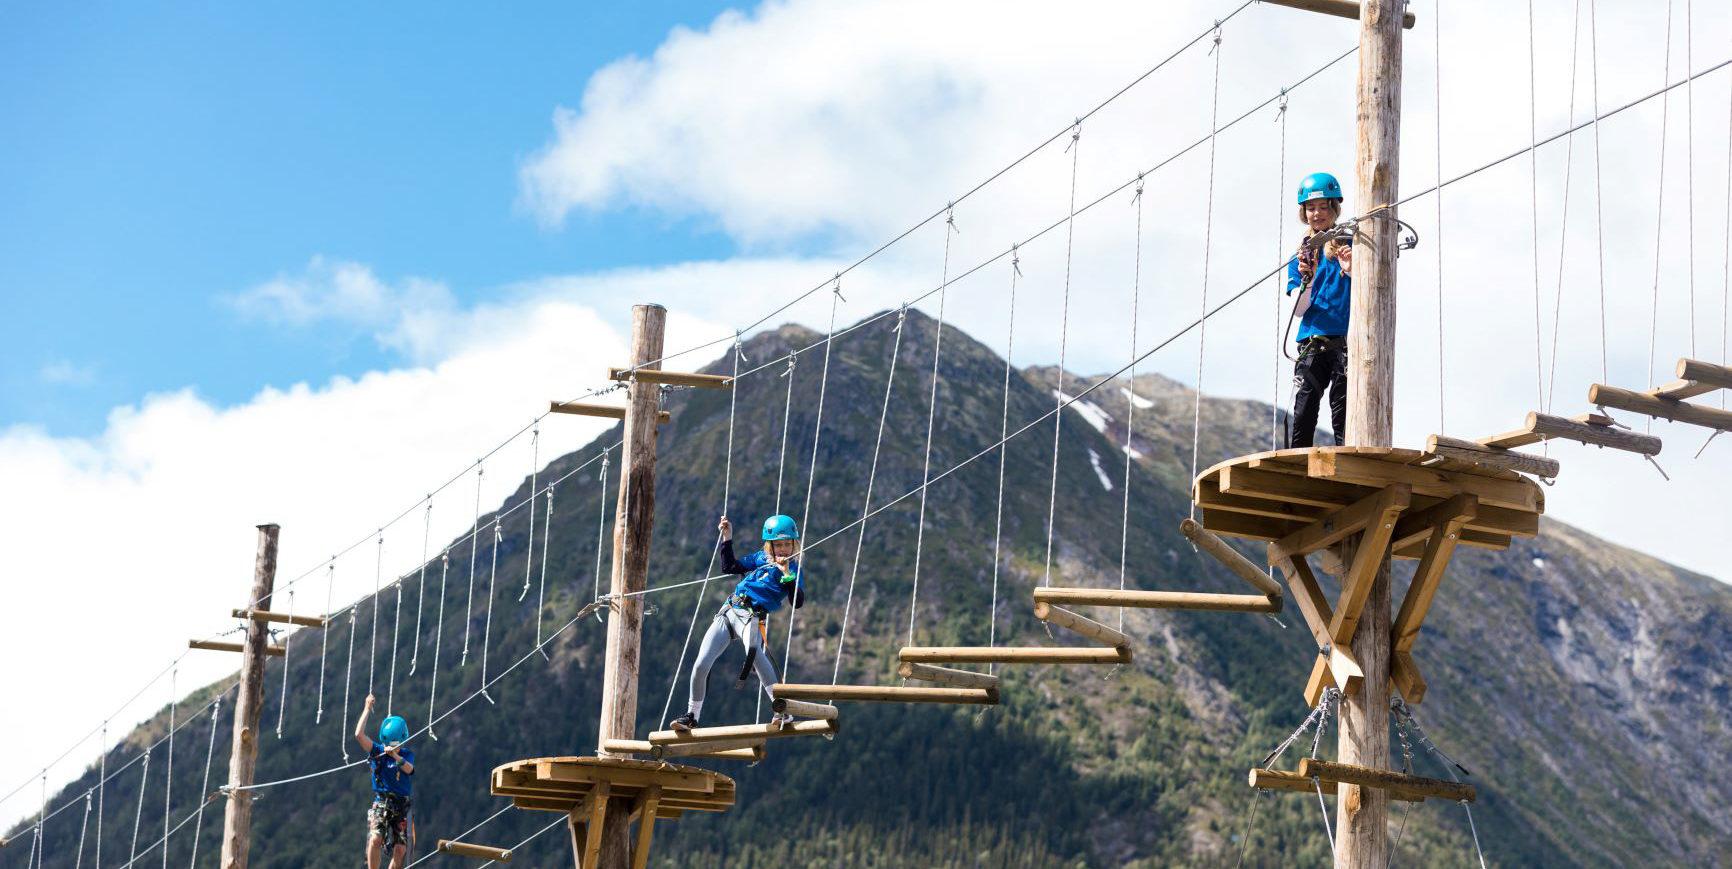 Lom aktivitetspark klatreløype